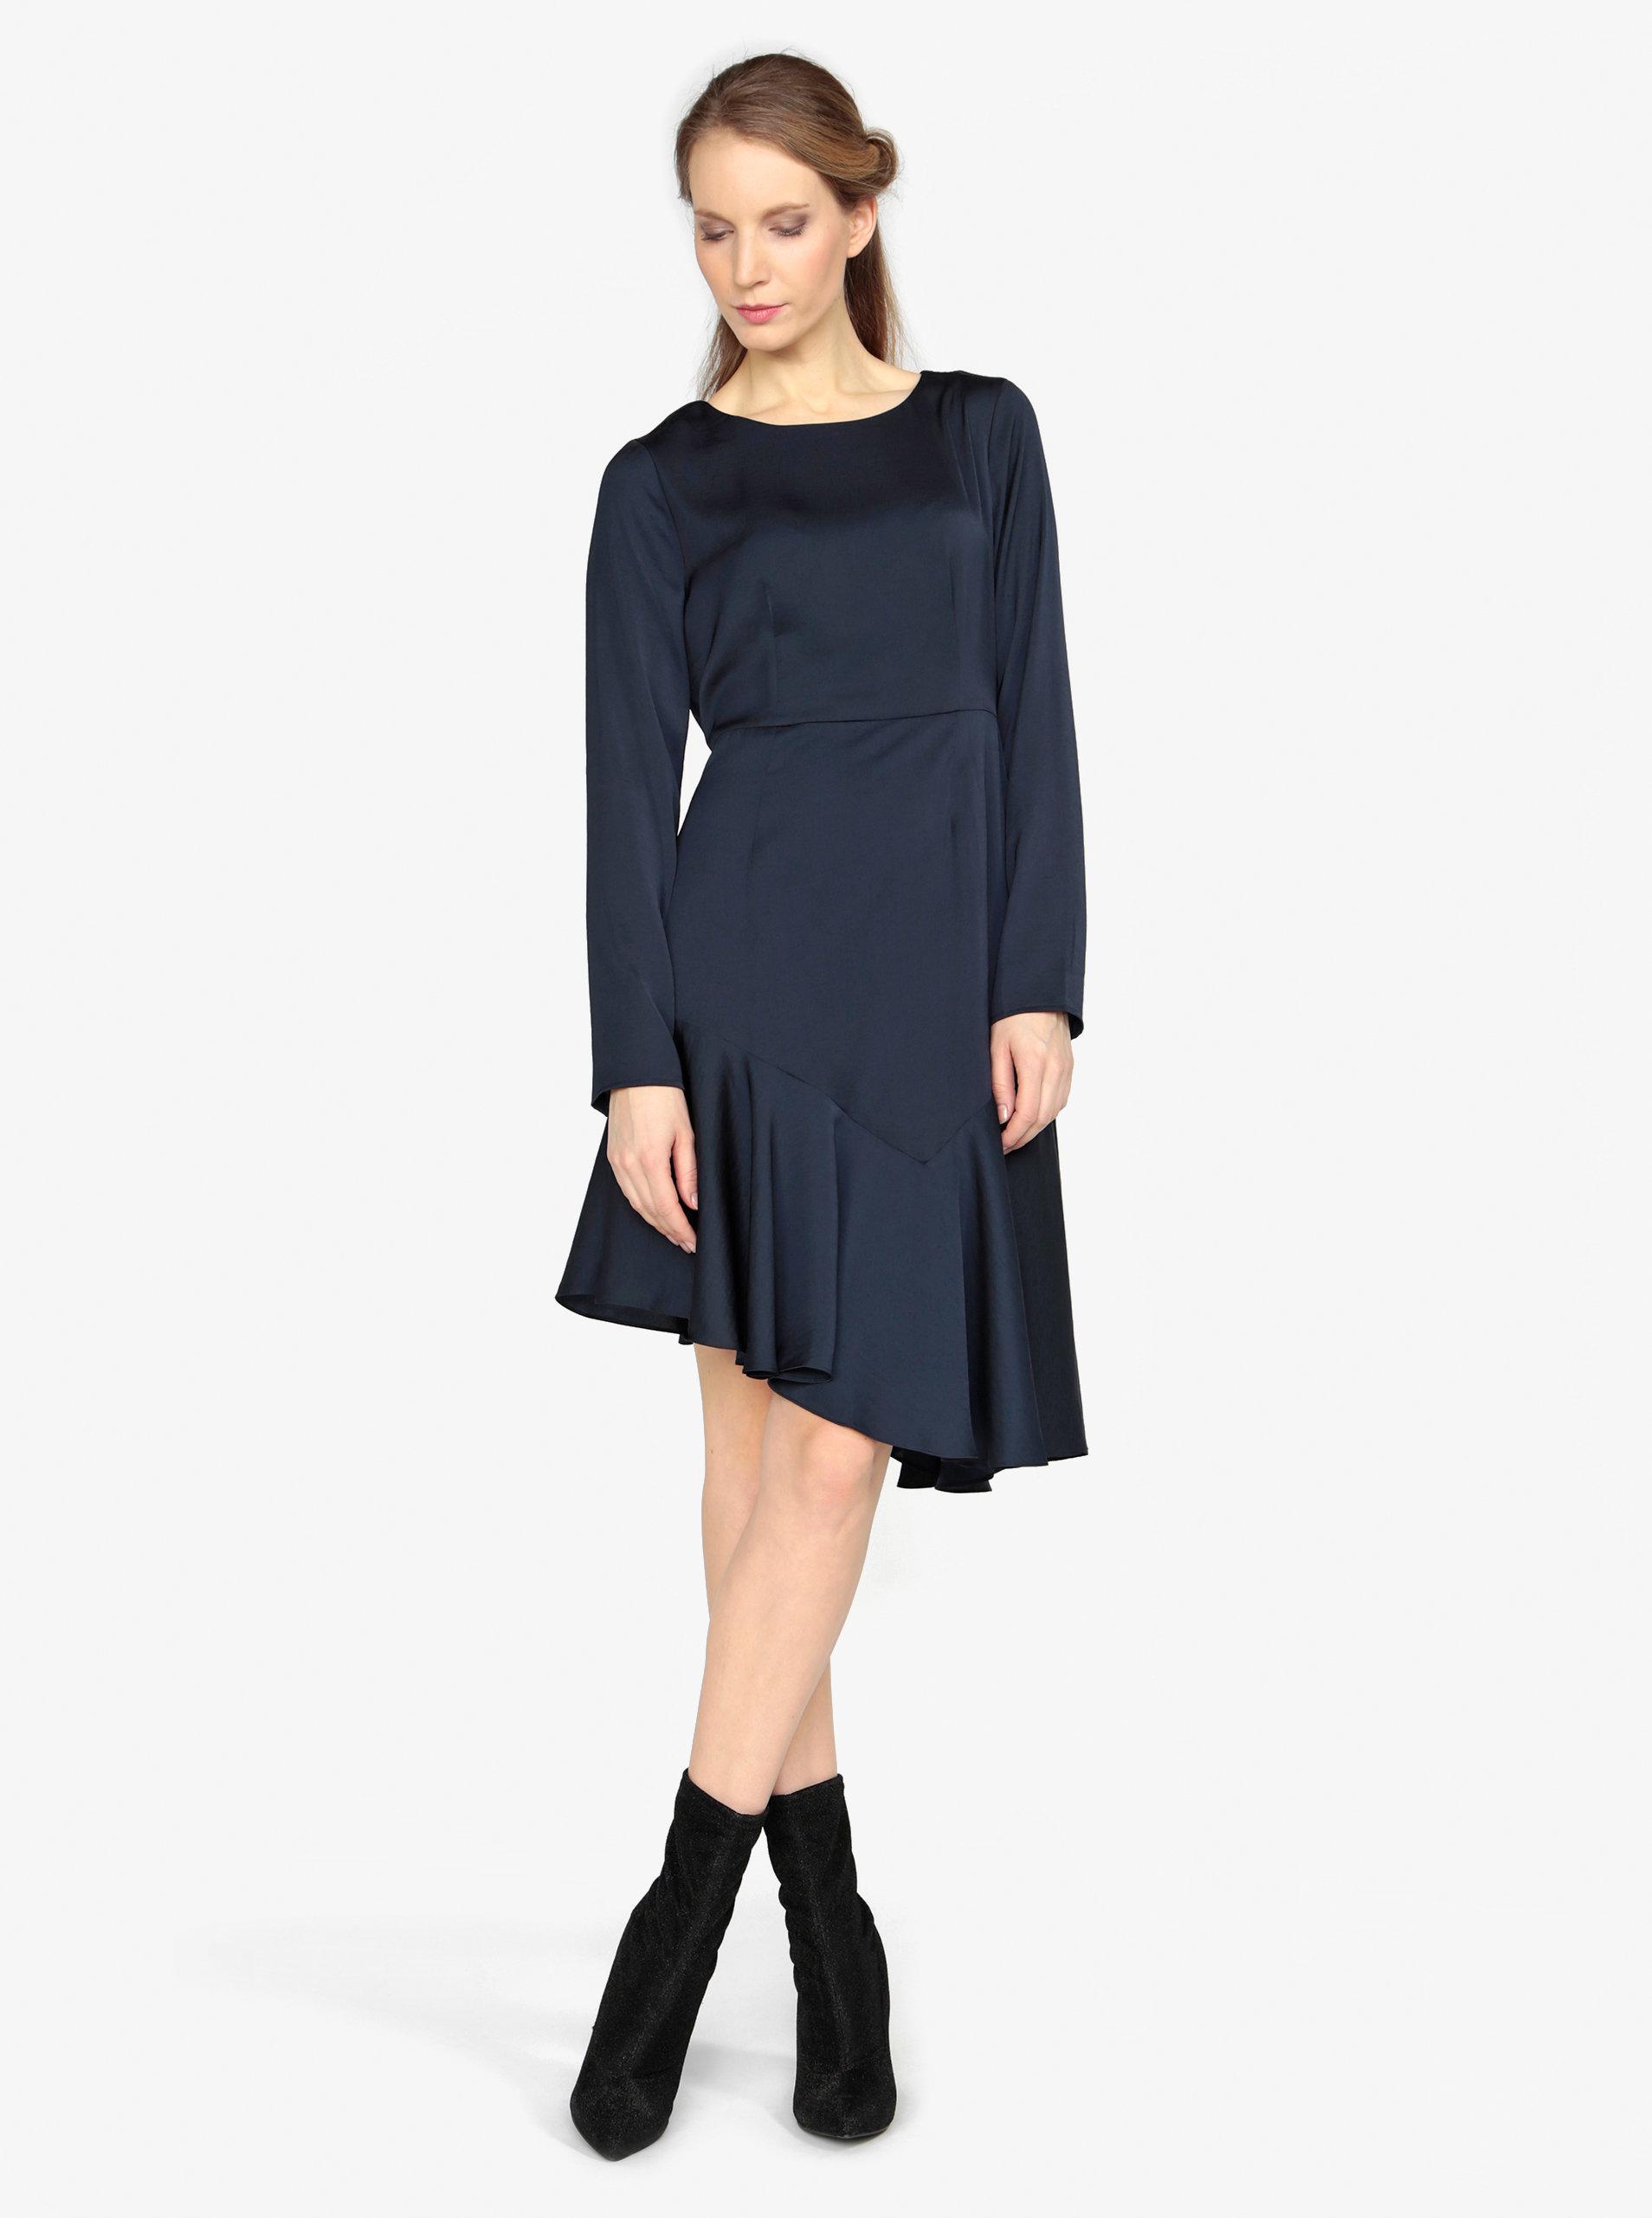 Tmavě modré asymetrické šaty s dlouhým rukávem VERO MODA Elsa ... 3acef6777d